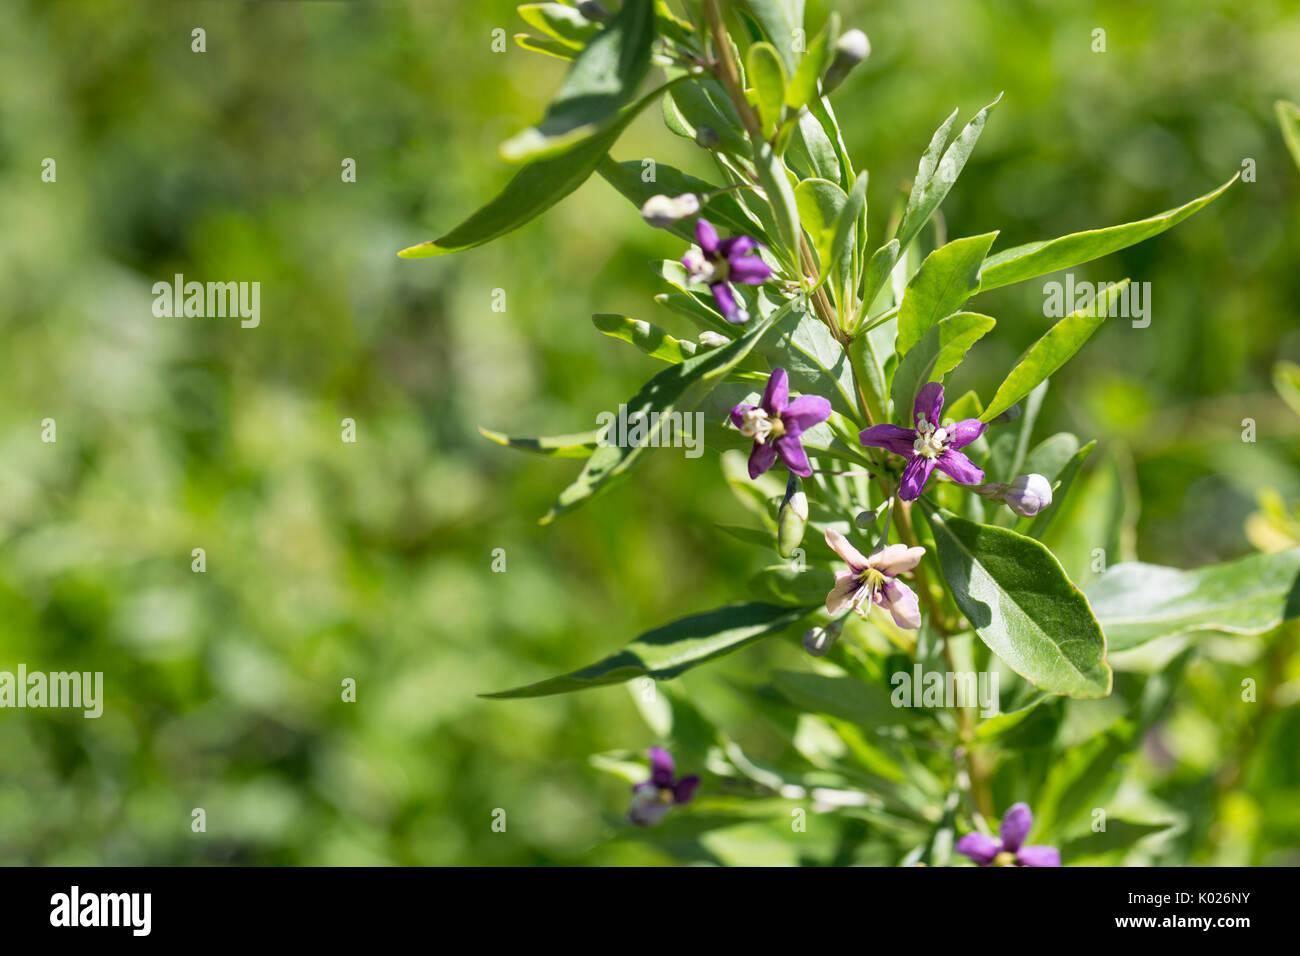 Flowering Goji Berry Plant Stock Photo Alamy